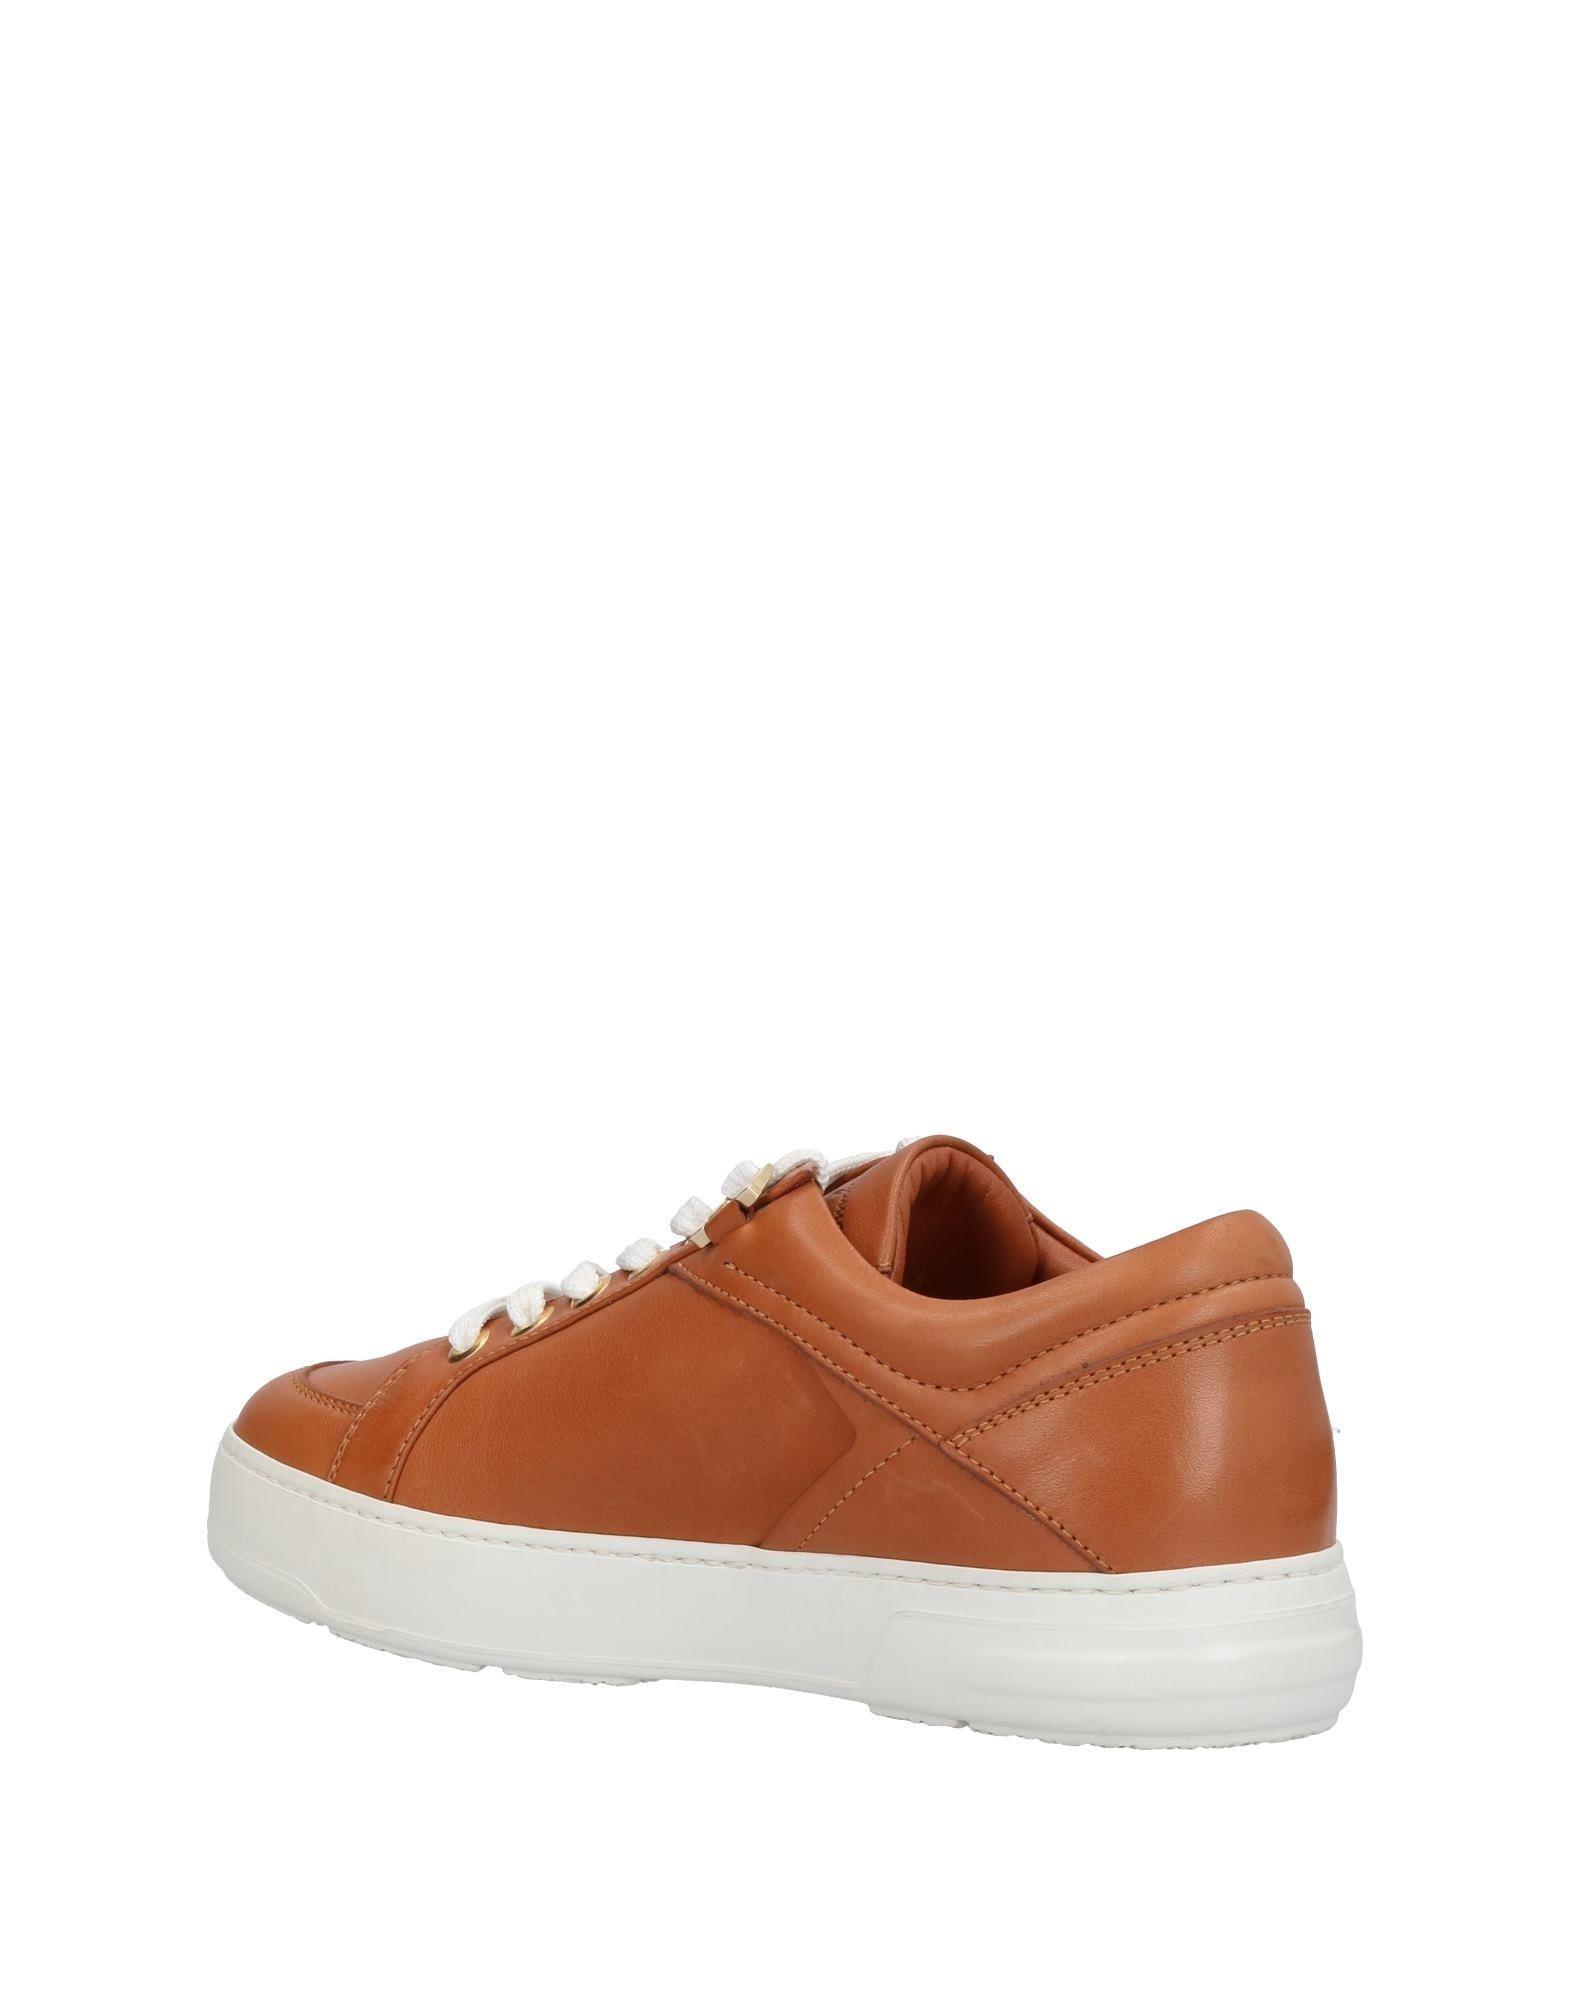 Ferragamo Leather Low-tops & Sneakers in Brown